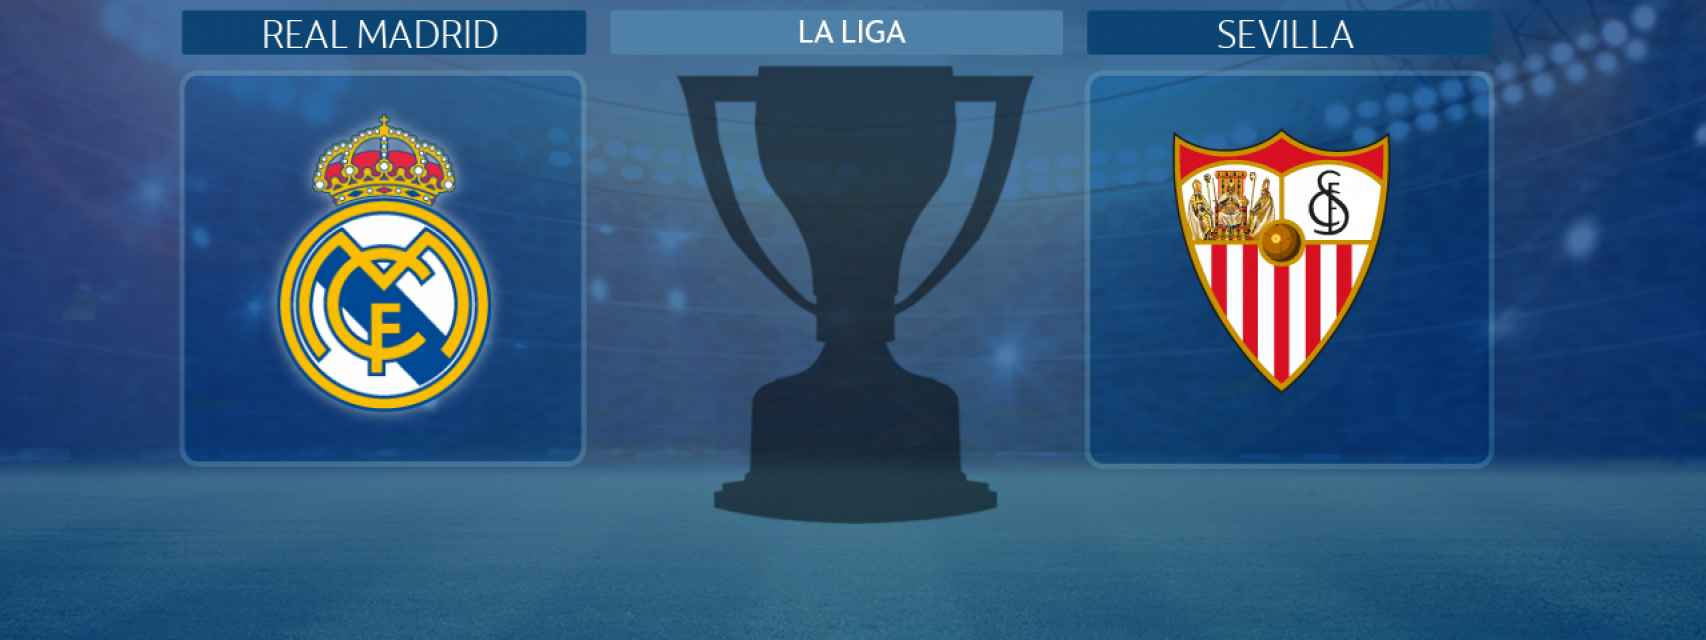 Real Madrid - Sevilla, partido de La Liga